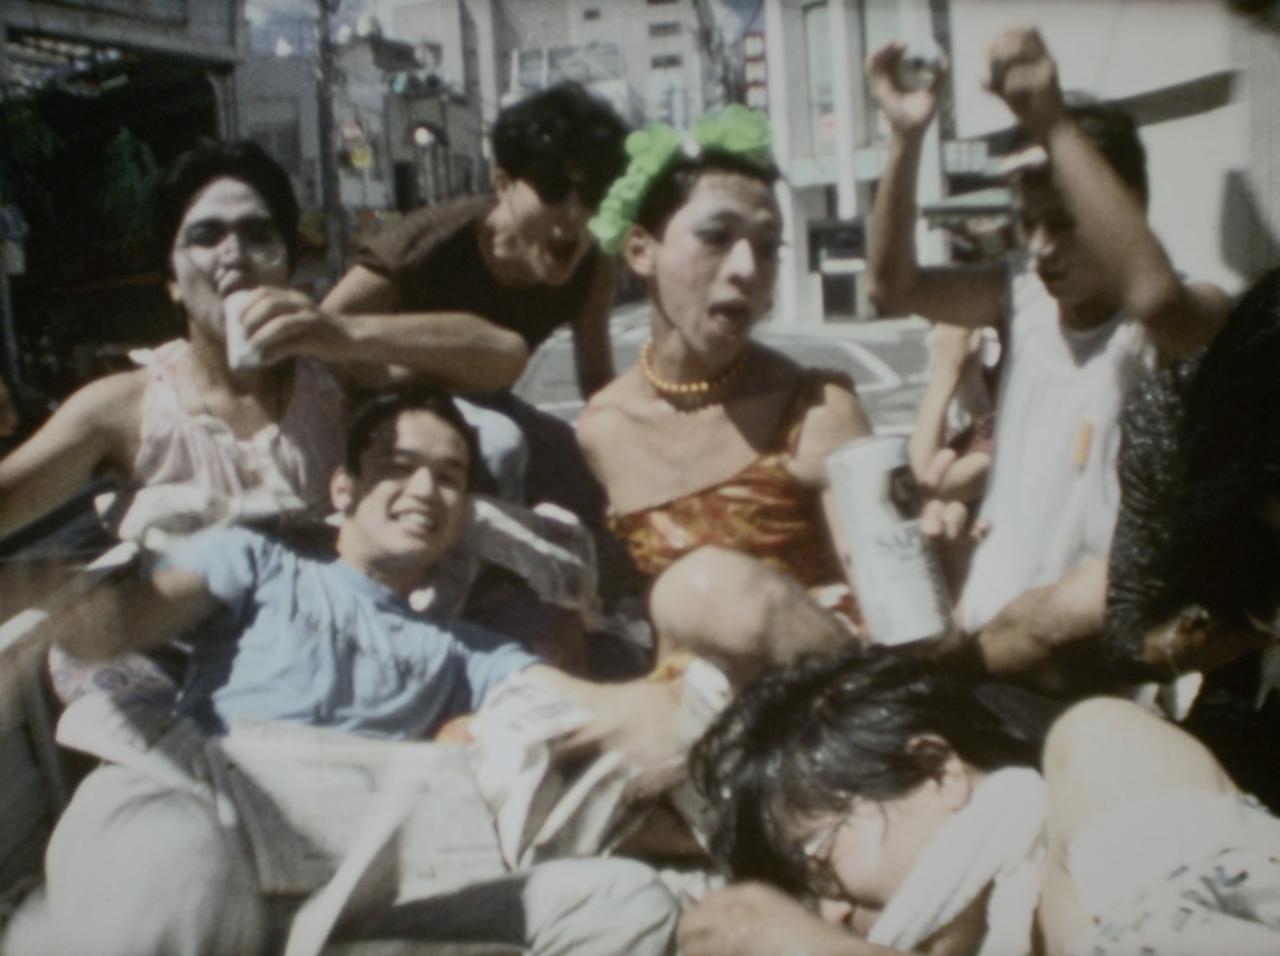 画像: 『愛の街角2丁目3番地』 1986年/カラー/93分 監督:平野勝之 『青春100キロ』 『監督失格』